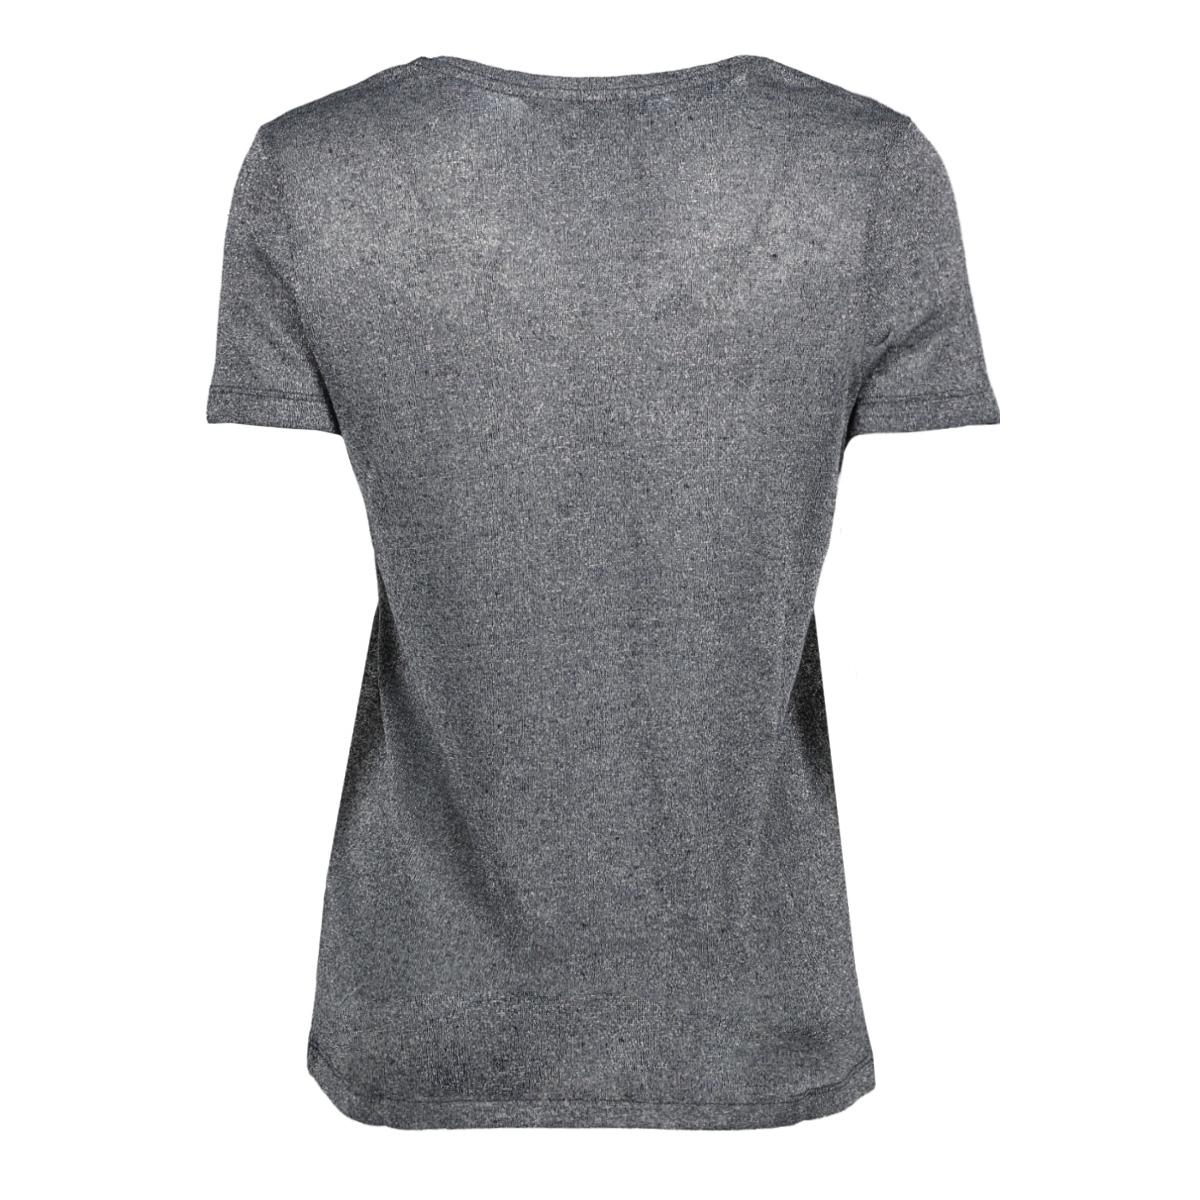 vmreza pure ss lurex linen top 10193194 vero moda t-shirt night sky/silver lur